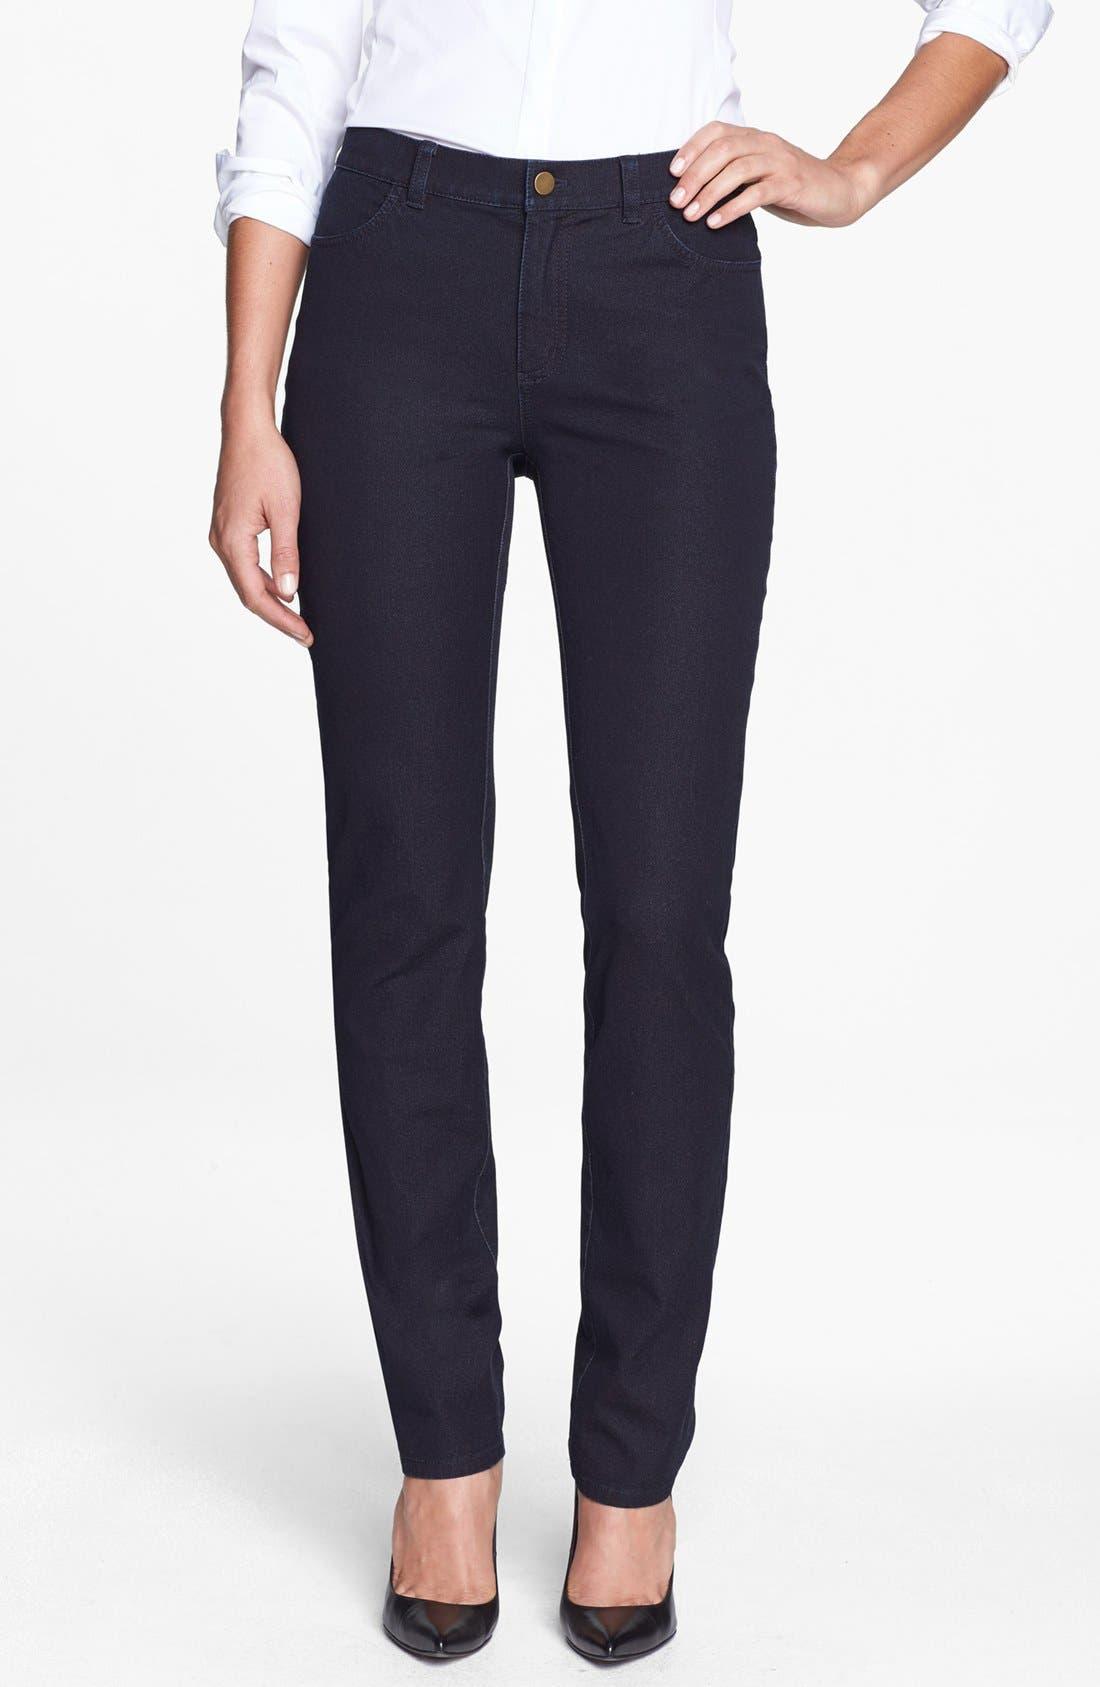 Alternate Image 1 Selected - Lafayette 148 New York Slim Leg Curvy Stretch Jeans